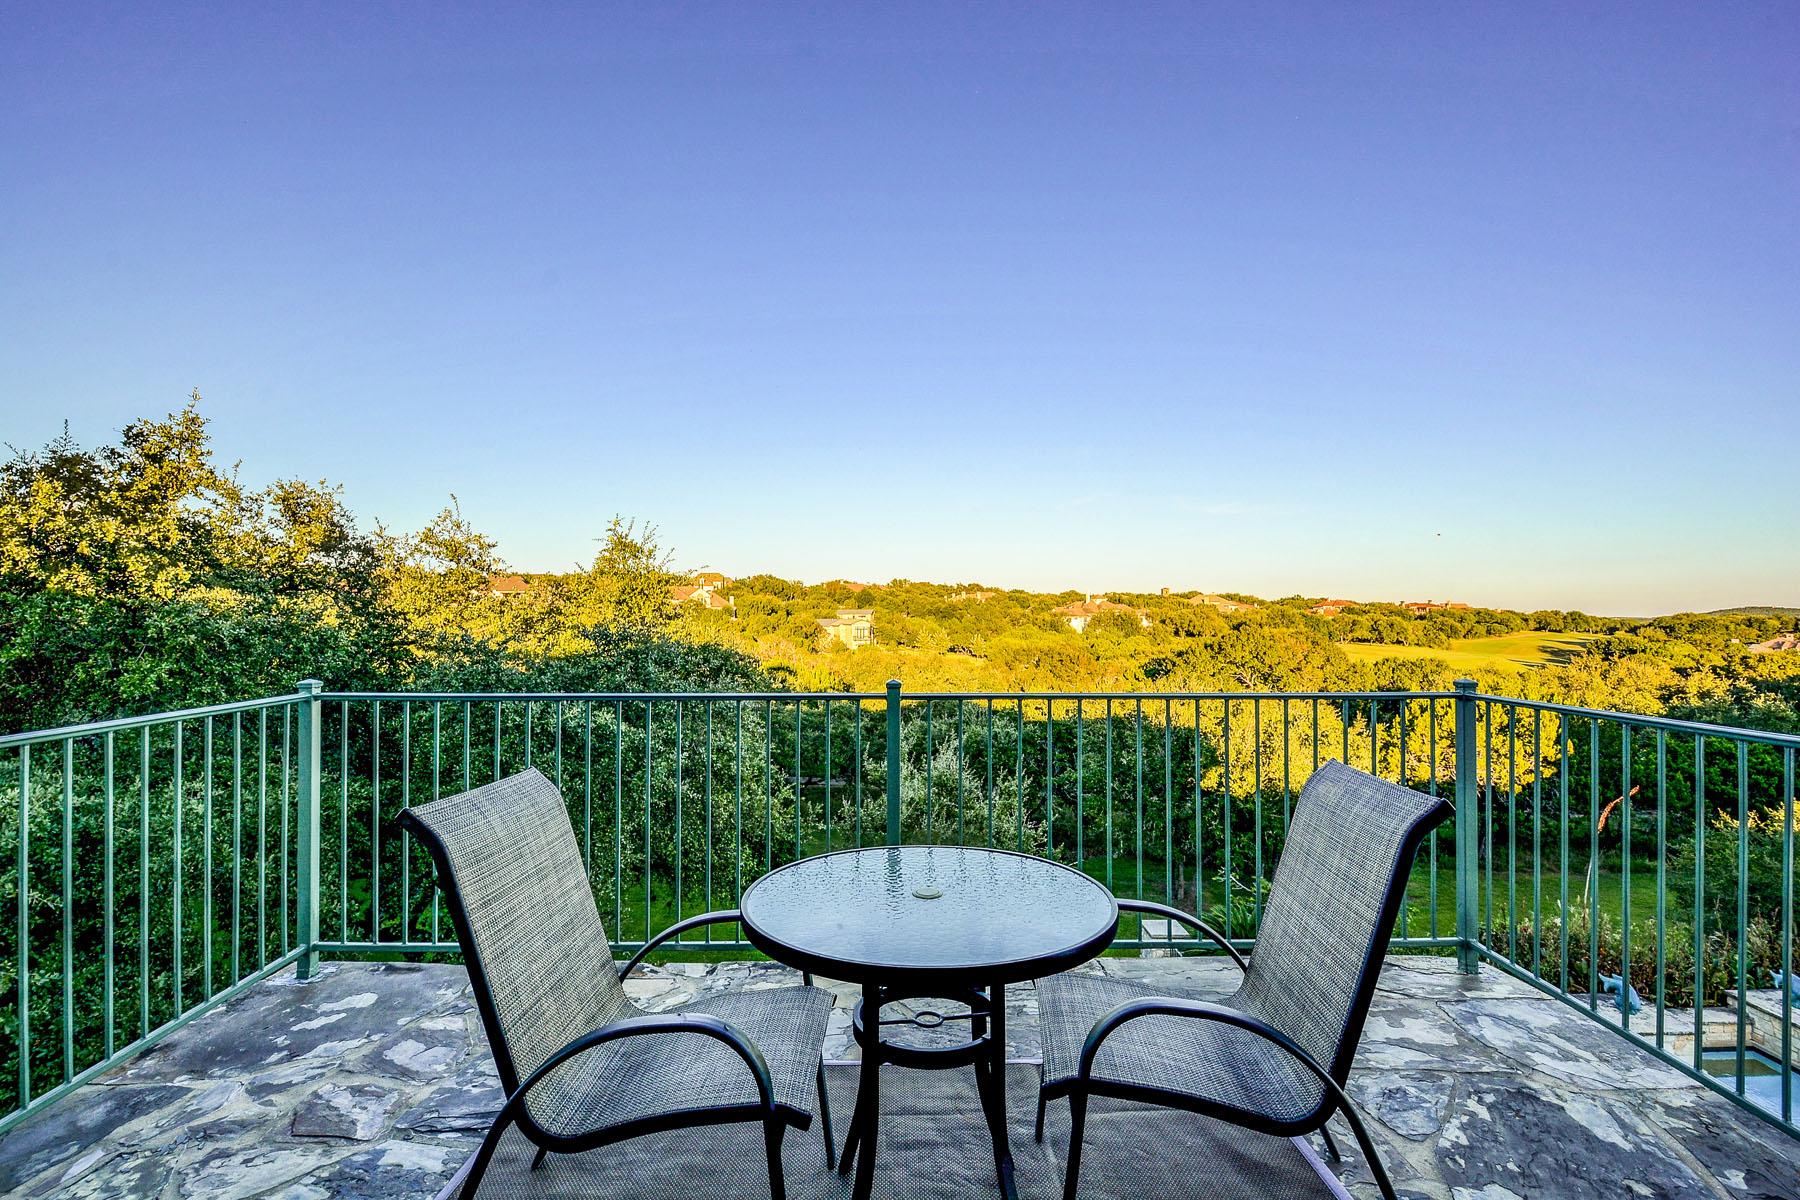 Additional photo for property listing at Sprawling Barton Creek Estate 8606 Navidad Dr Austin, Texas 78735 United States